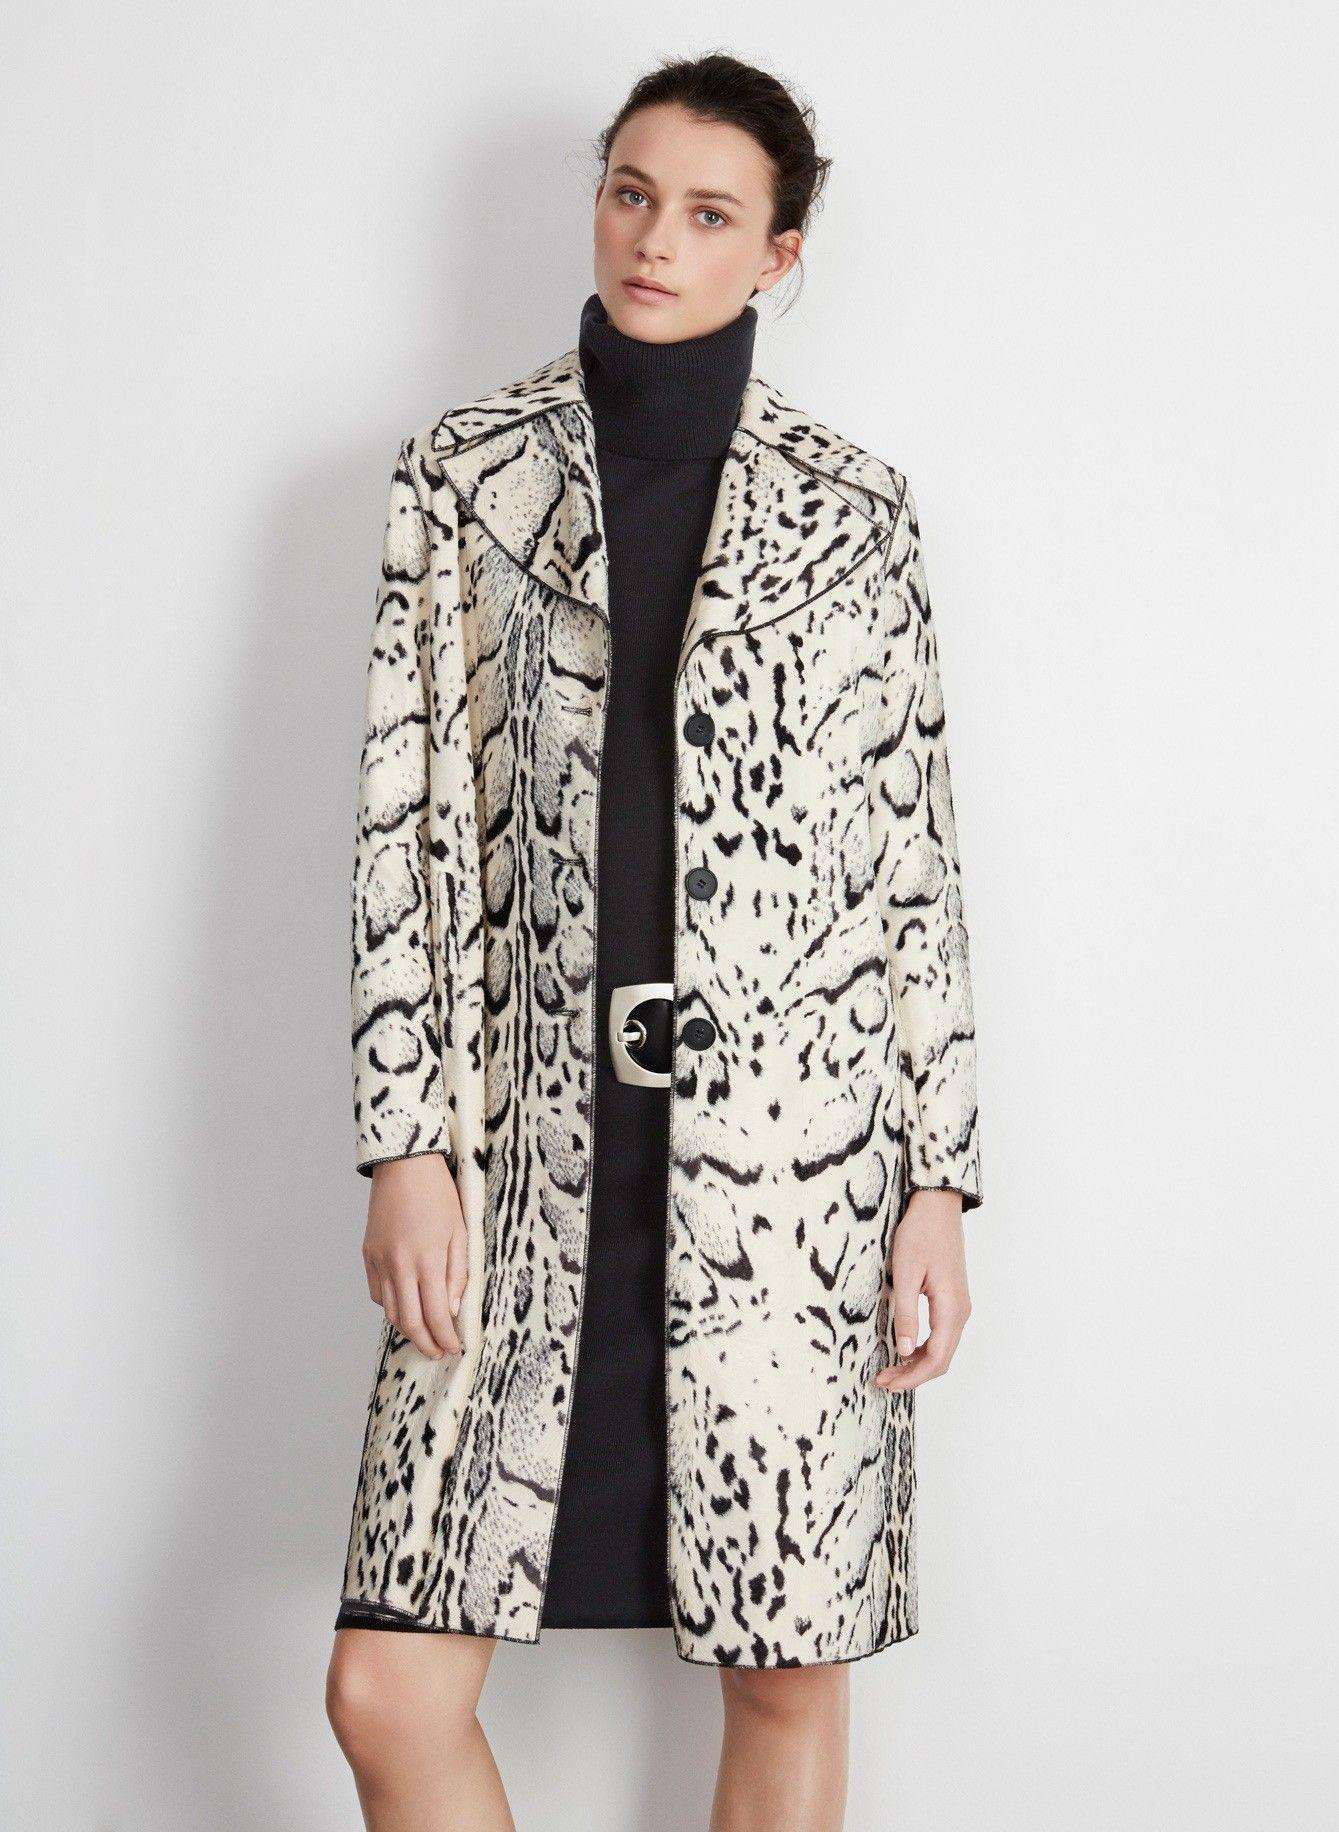 Abrigo eco piel con animal print abrigos adolfo for Abrigos adolfo dominguez outlet